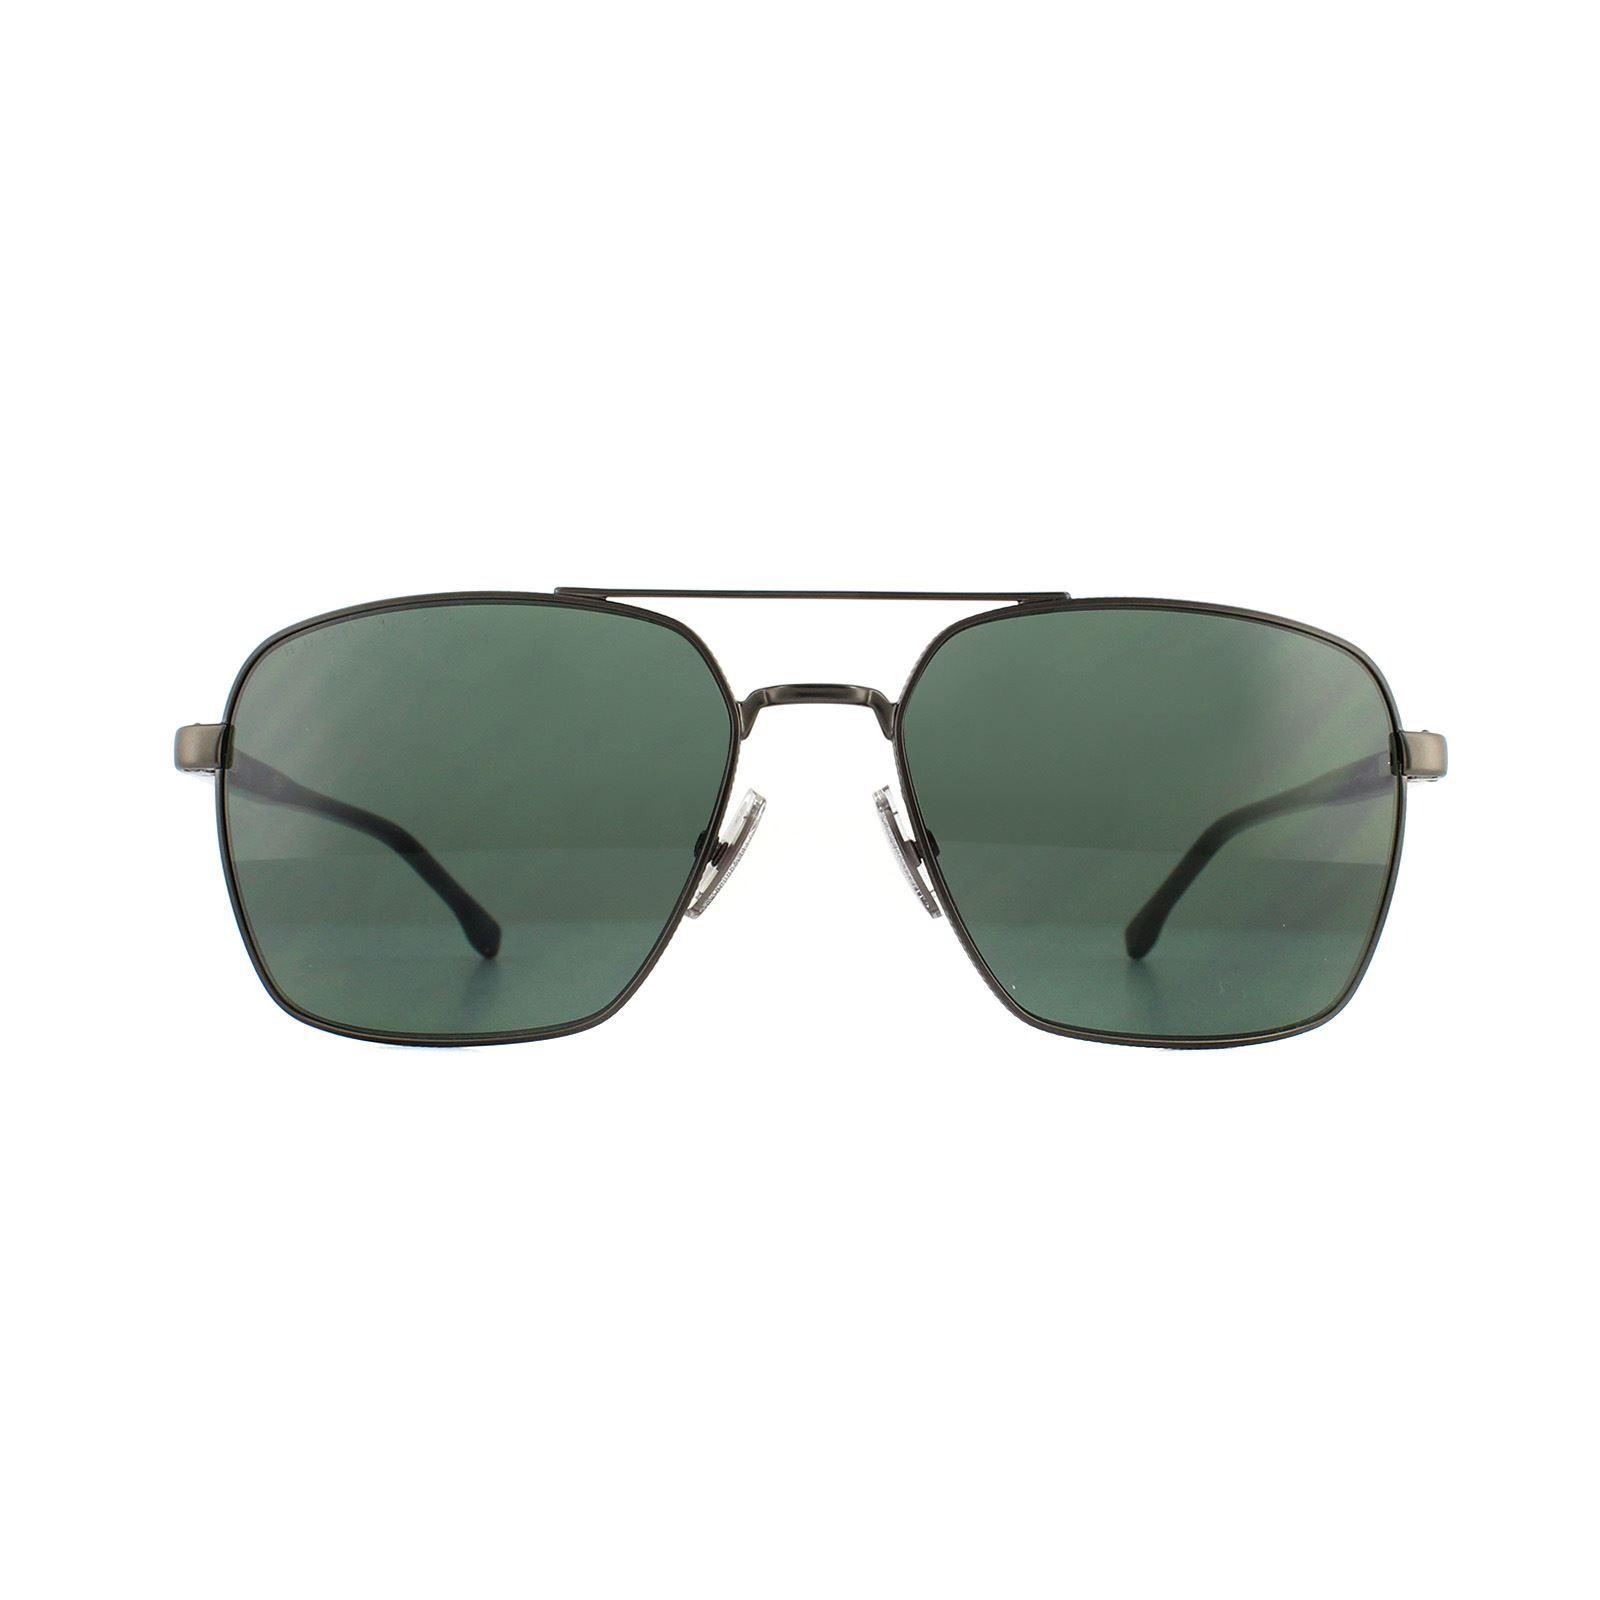 Hugo Boss Sunglasses 1045/S SVK QT Matte Ruthenium Green